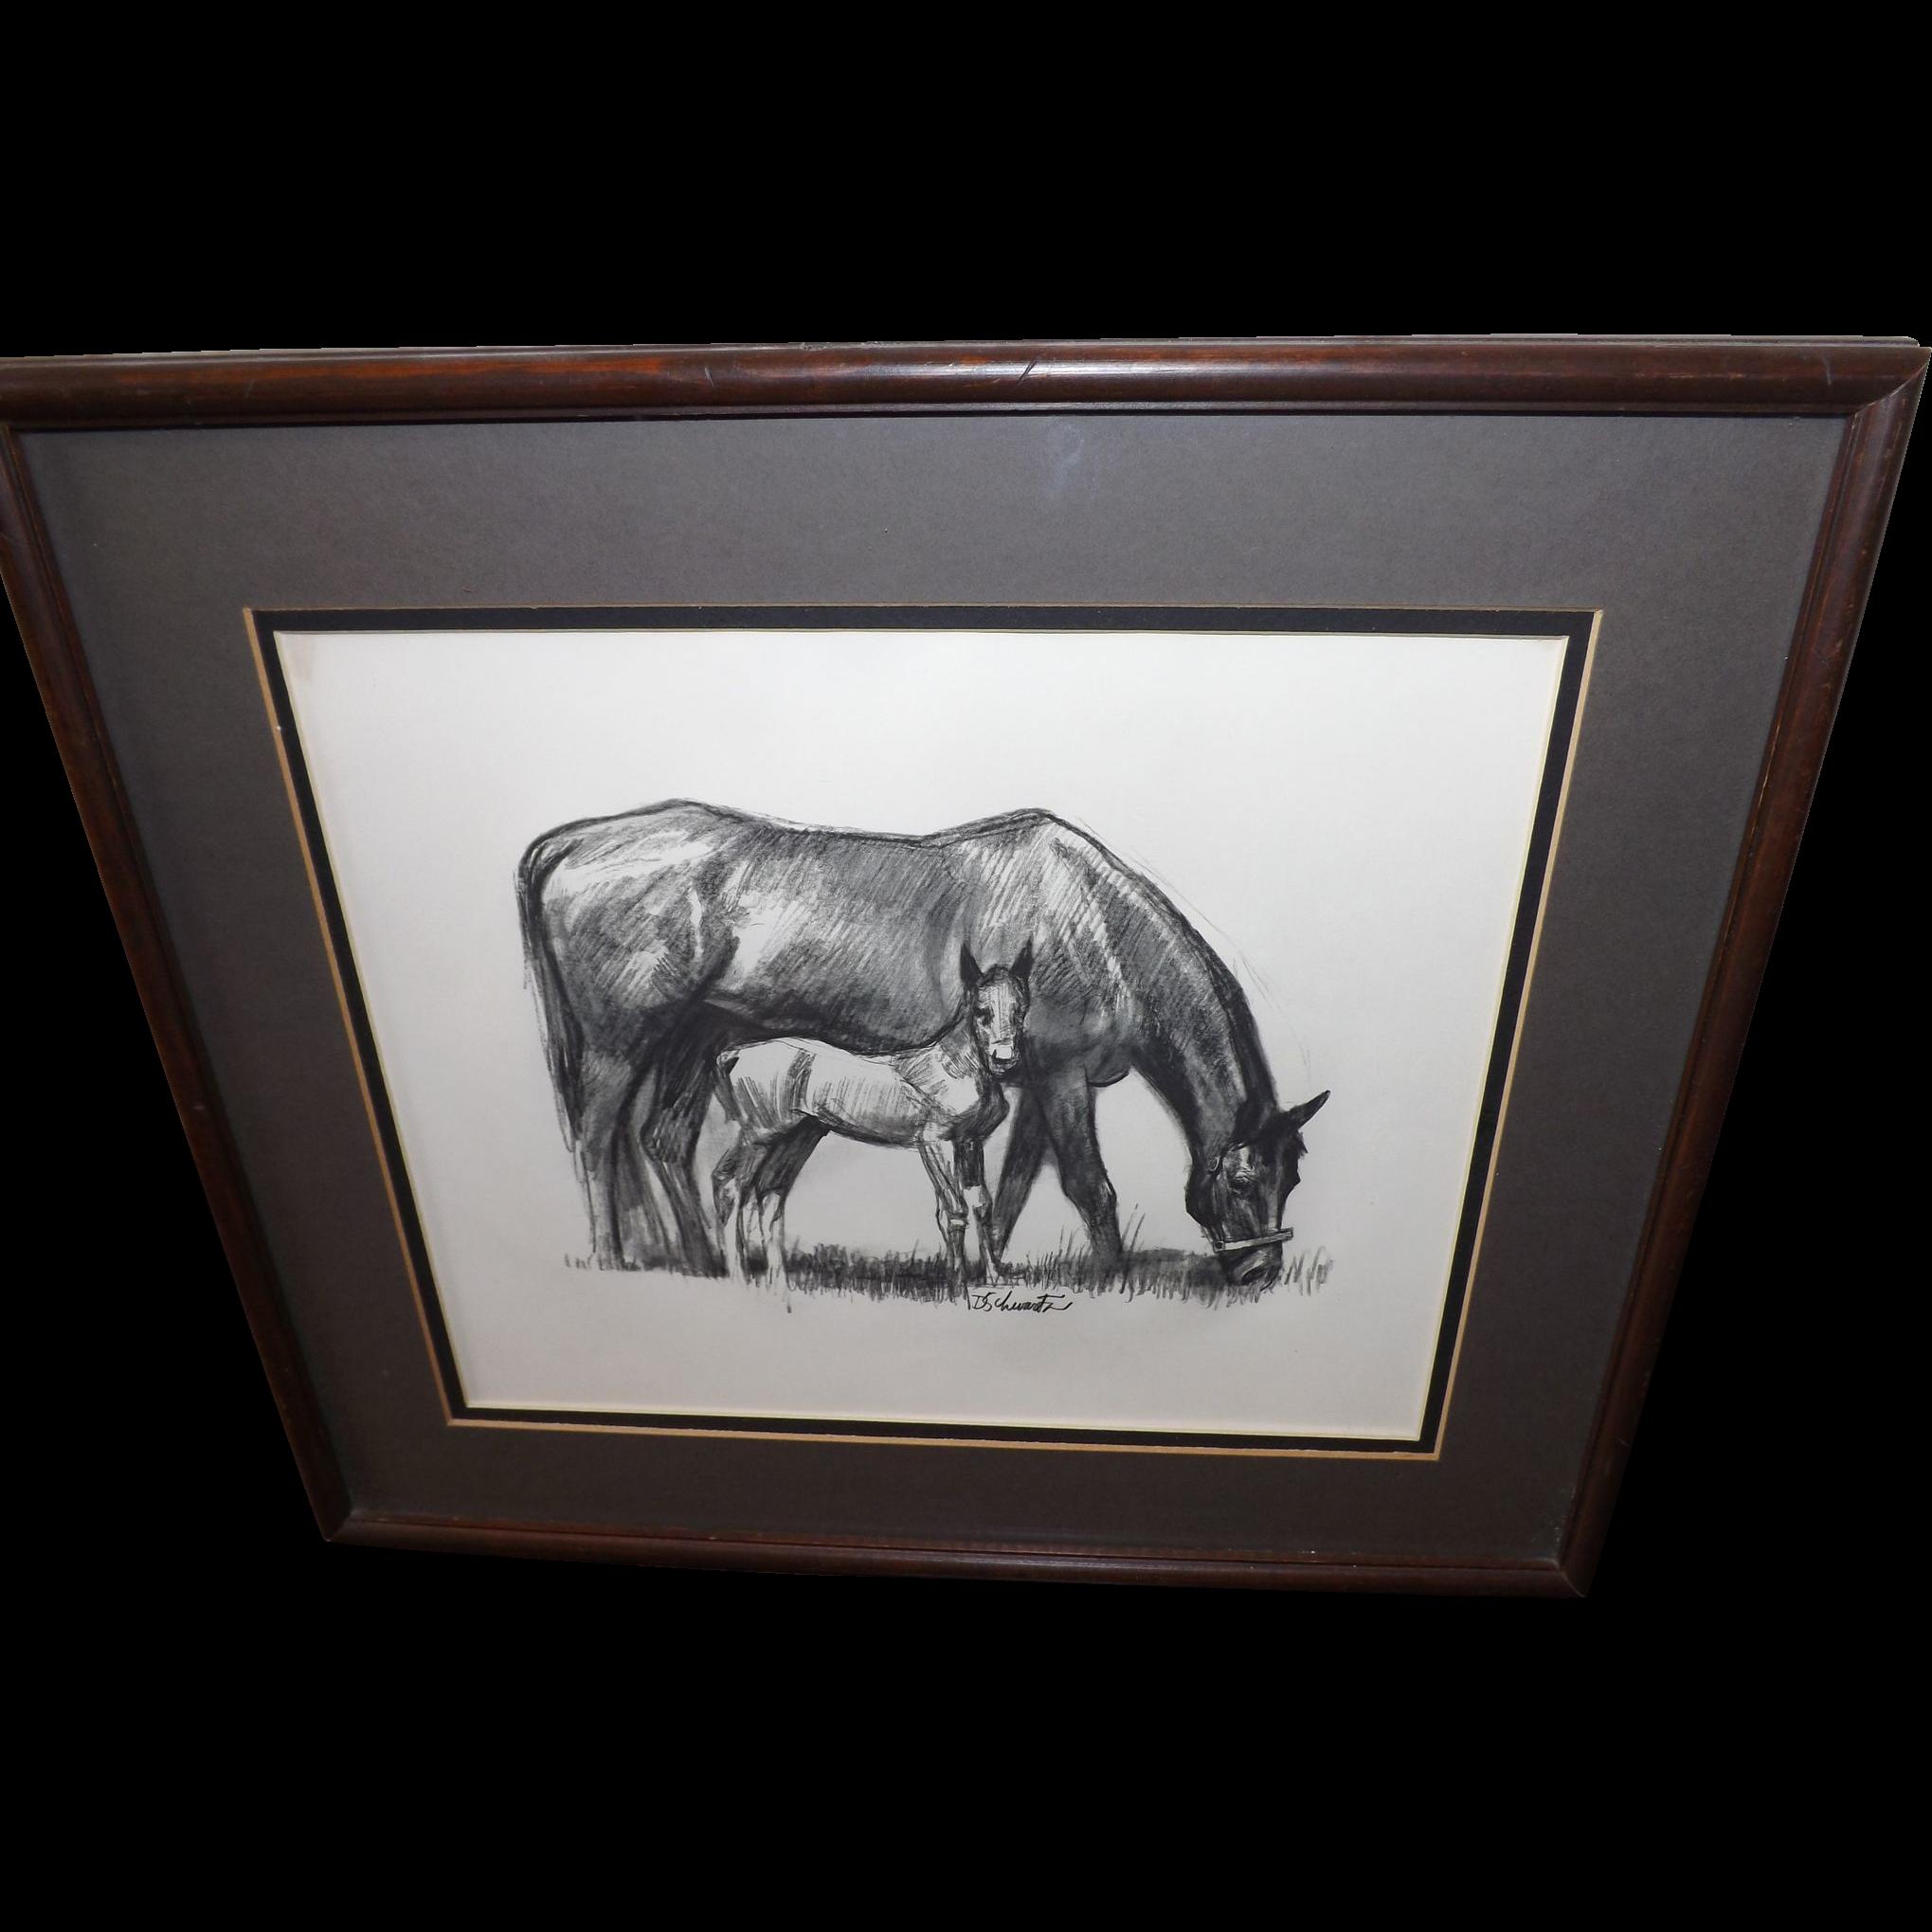 Vintage 1950's David Schwartz Photogravure Print - Mother Horse and Foal